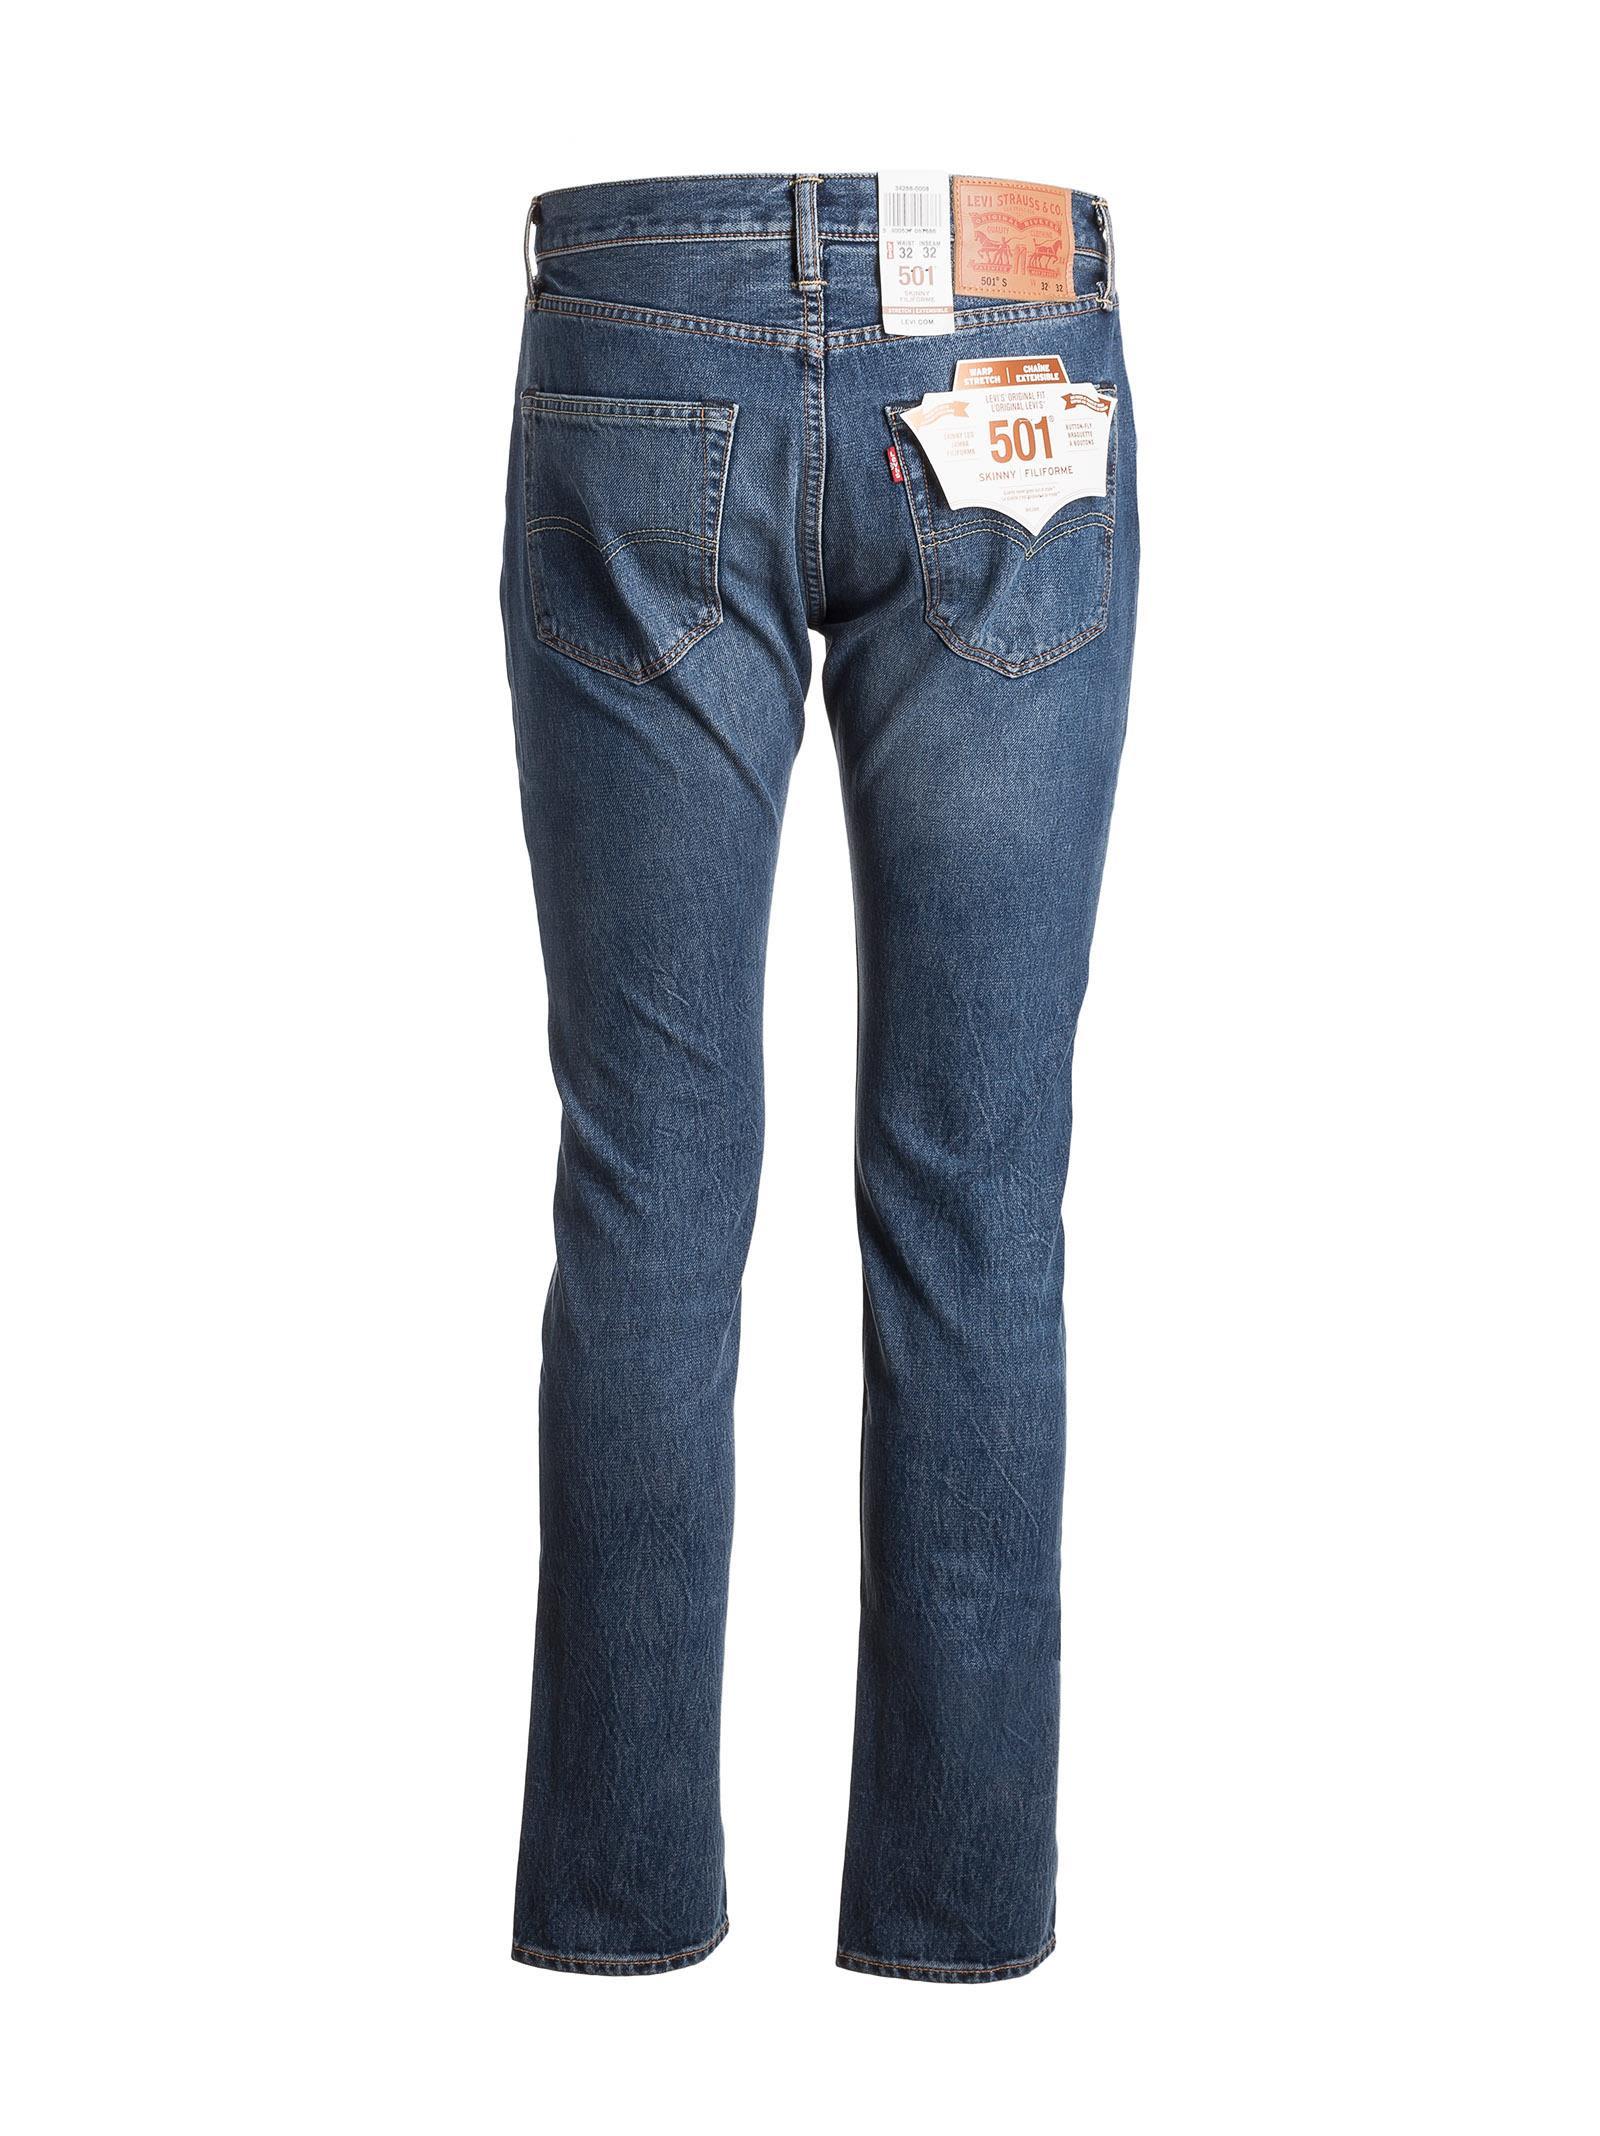 levi 39 s levi 39 s 501 skinny wrap stretch jeans men 39 s jeans. Black Bedroom Furniture Sets. Home Design Ideas